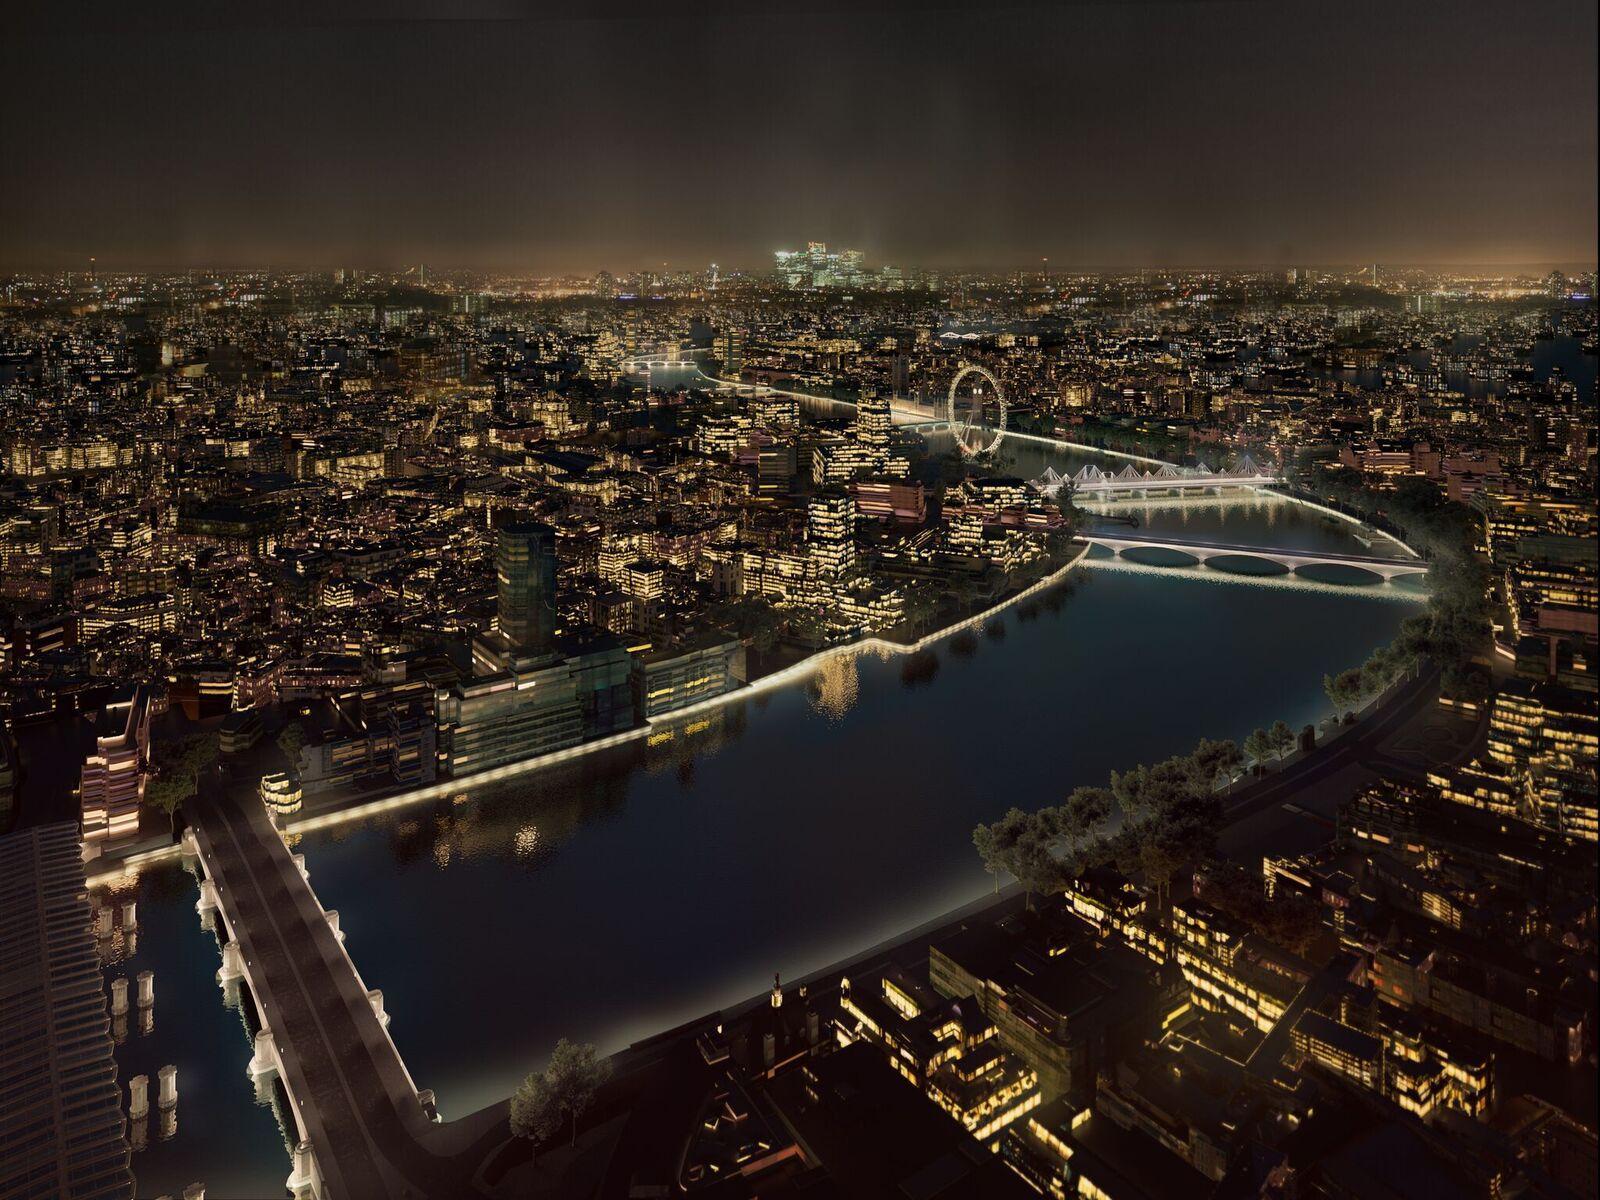 Marée haute, Masterplan, London, UK © MRC and AL_A